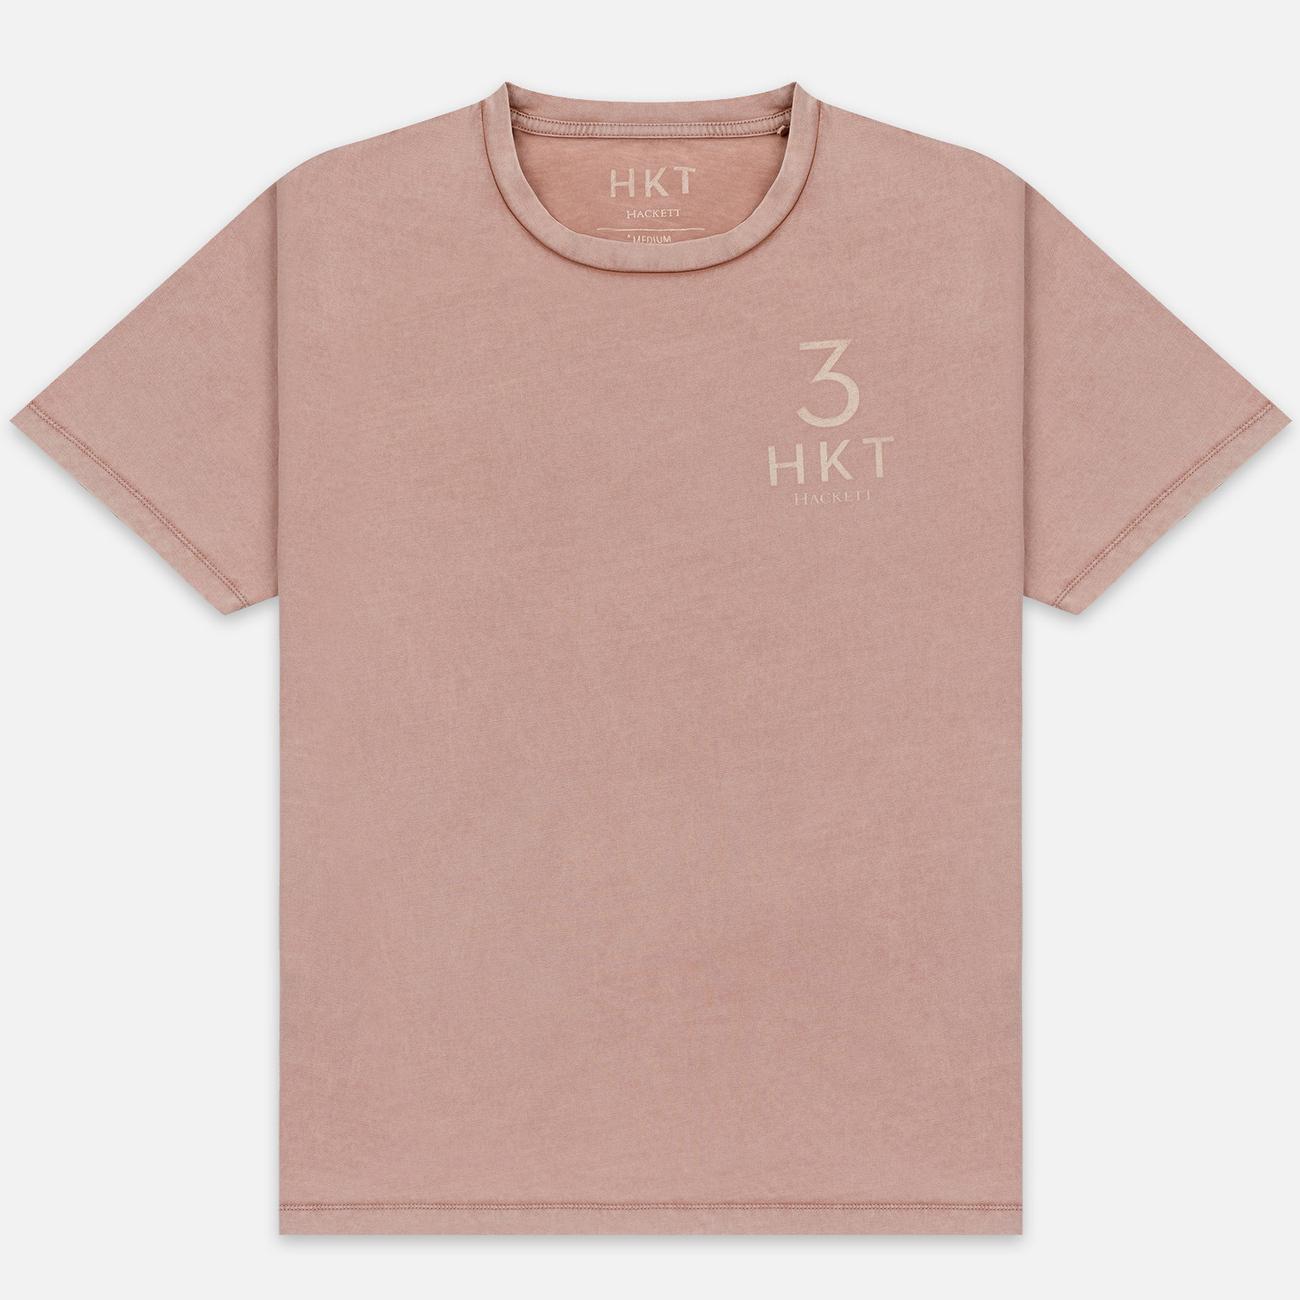 Мужская футболка Hackett Logo HKT 3 Coral